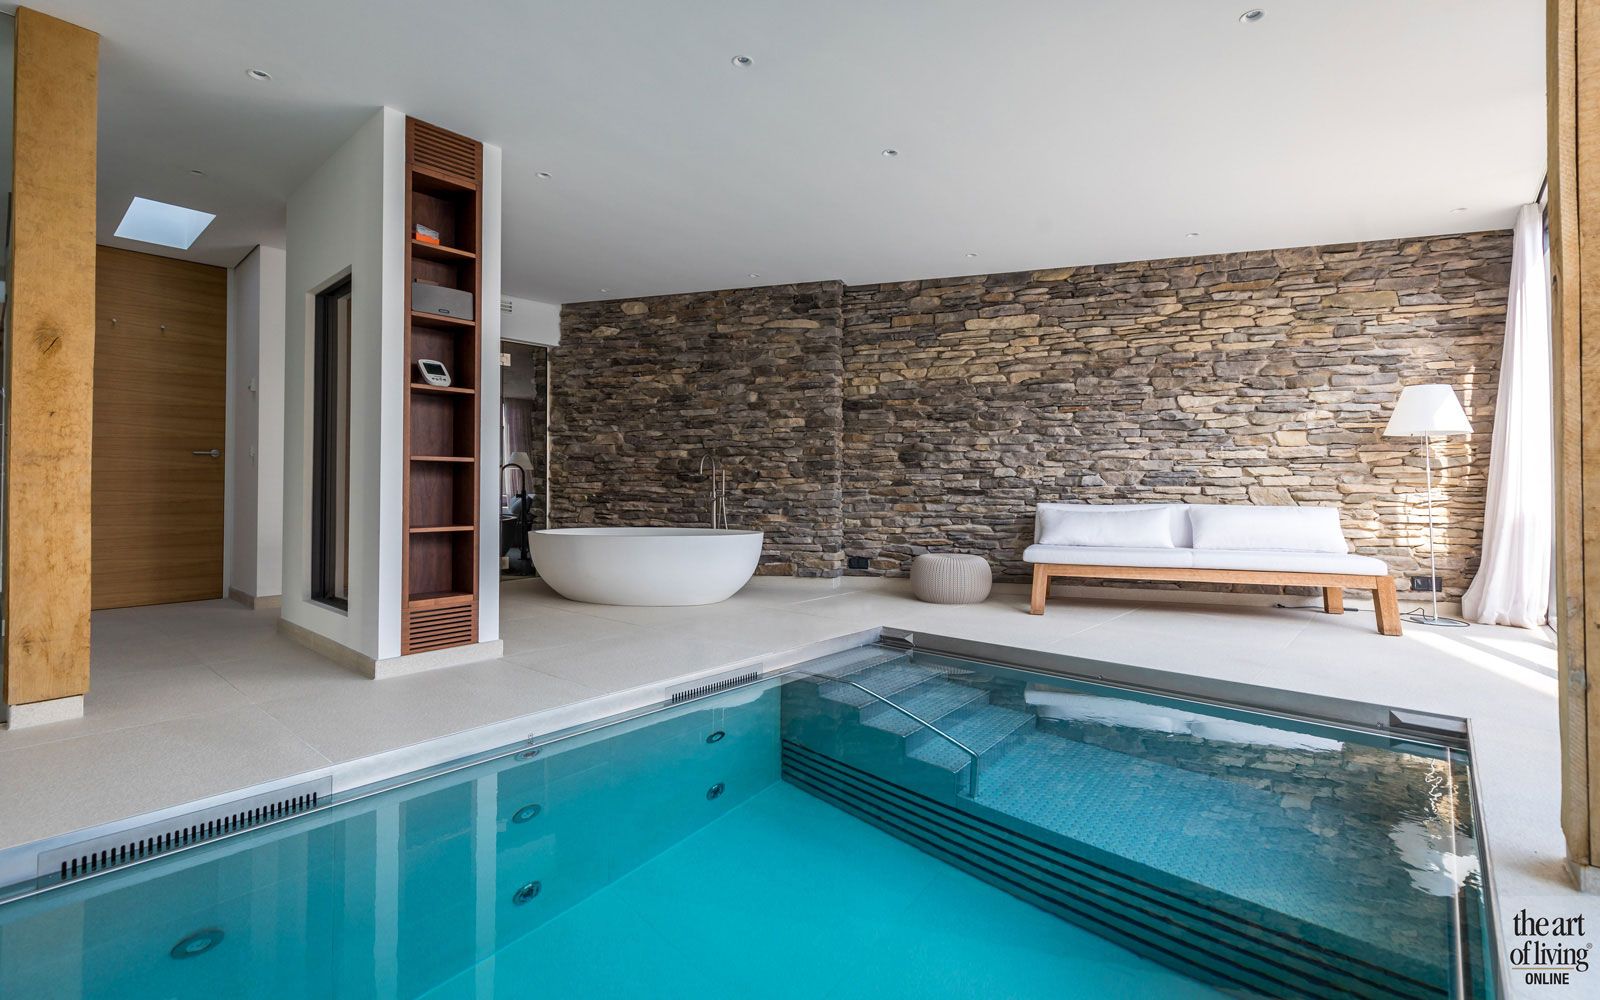 Zwembaden, Zwembad, Pool, Pools, bad, Wellness, Strandhuis, BOS Architecten, The Art of Living